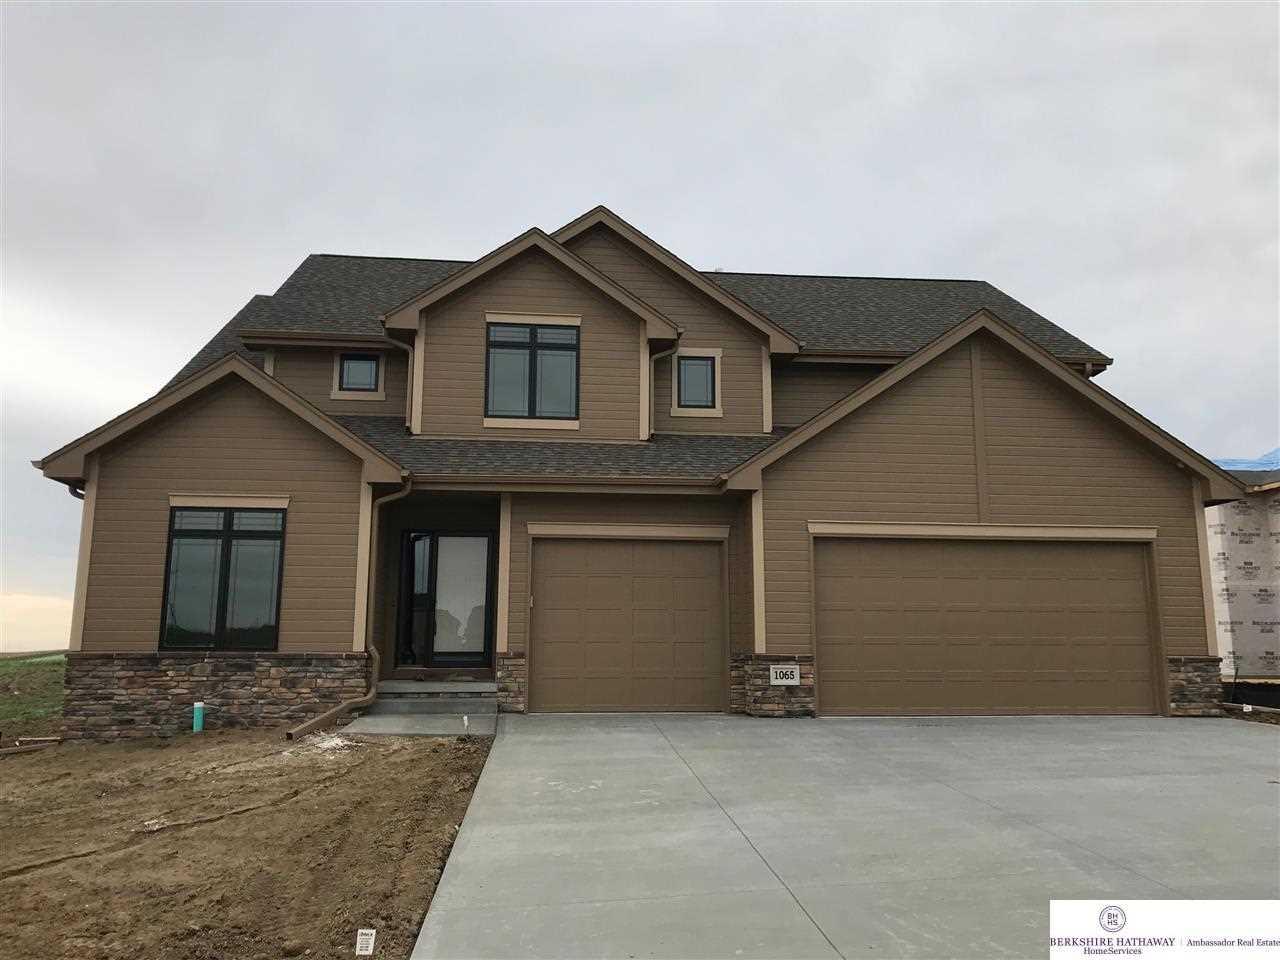 1065 Lilac Springfield, NE 68059 | MLS 21821277 Photo 1